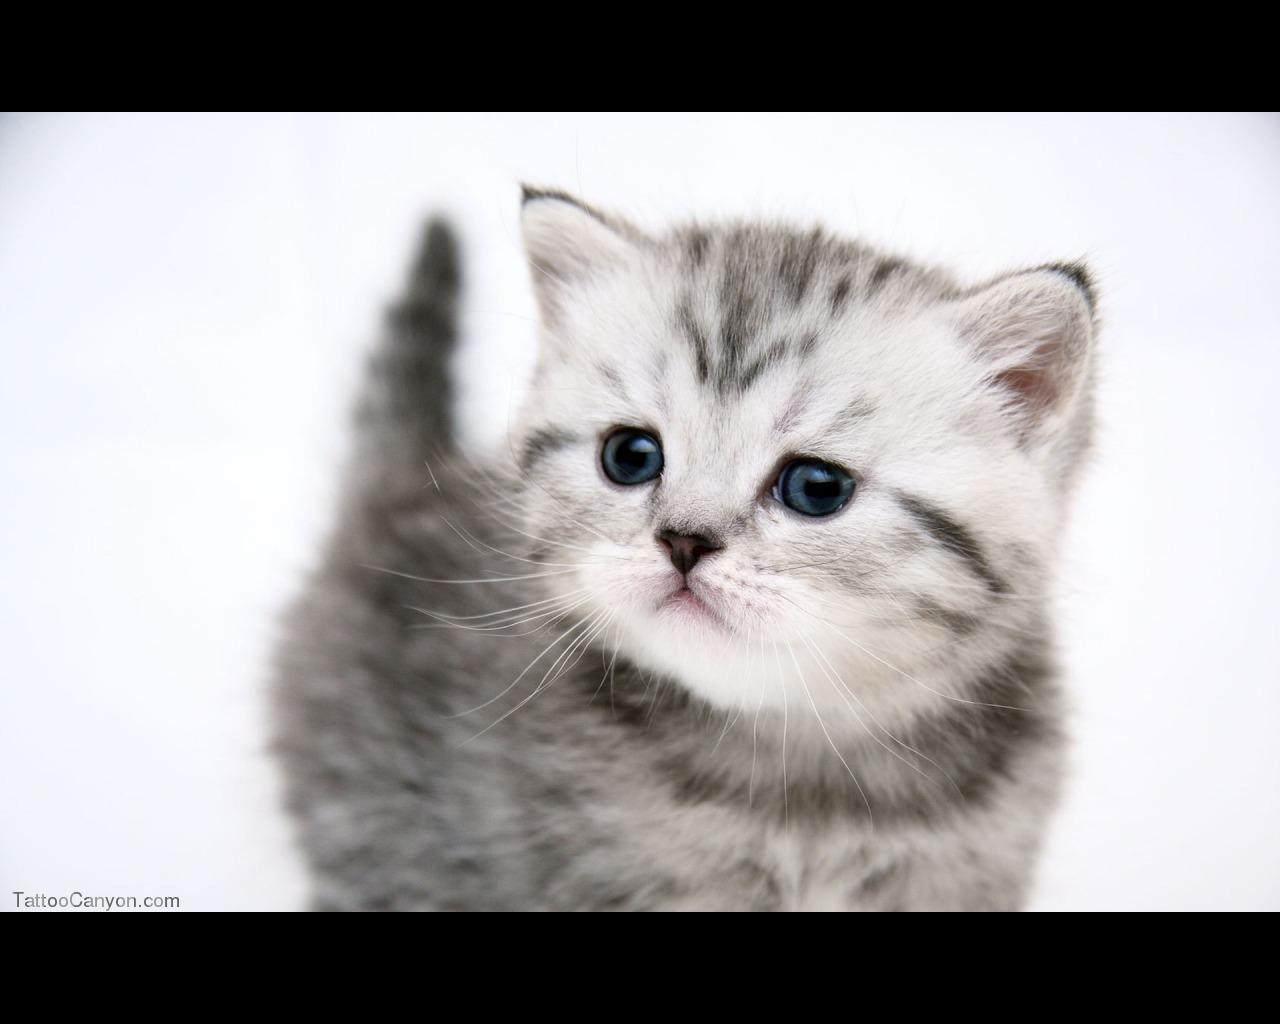 Very Funny Cat Photos 2 Desktop Wallpaper Wallpaper 1280x1024